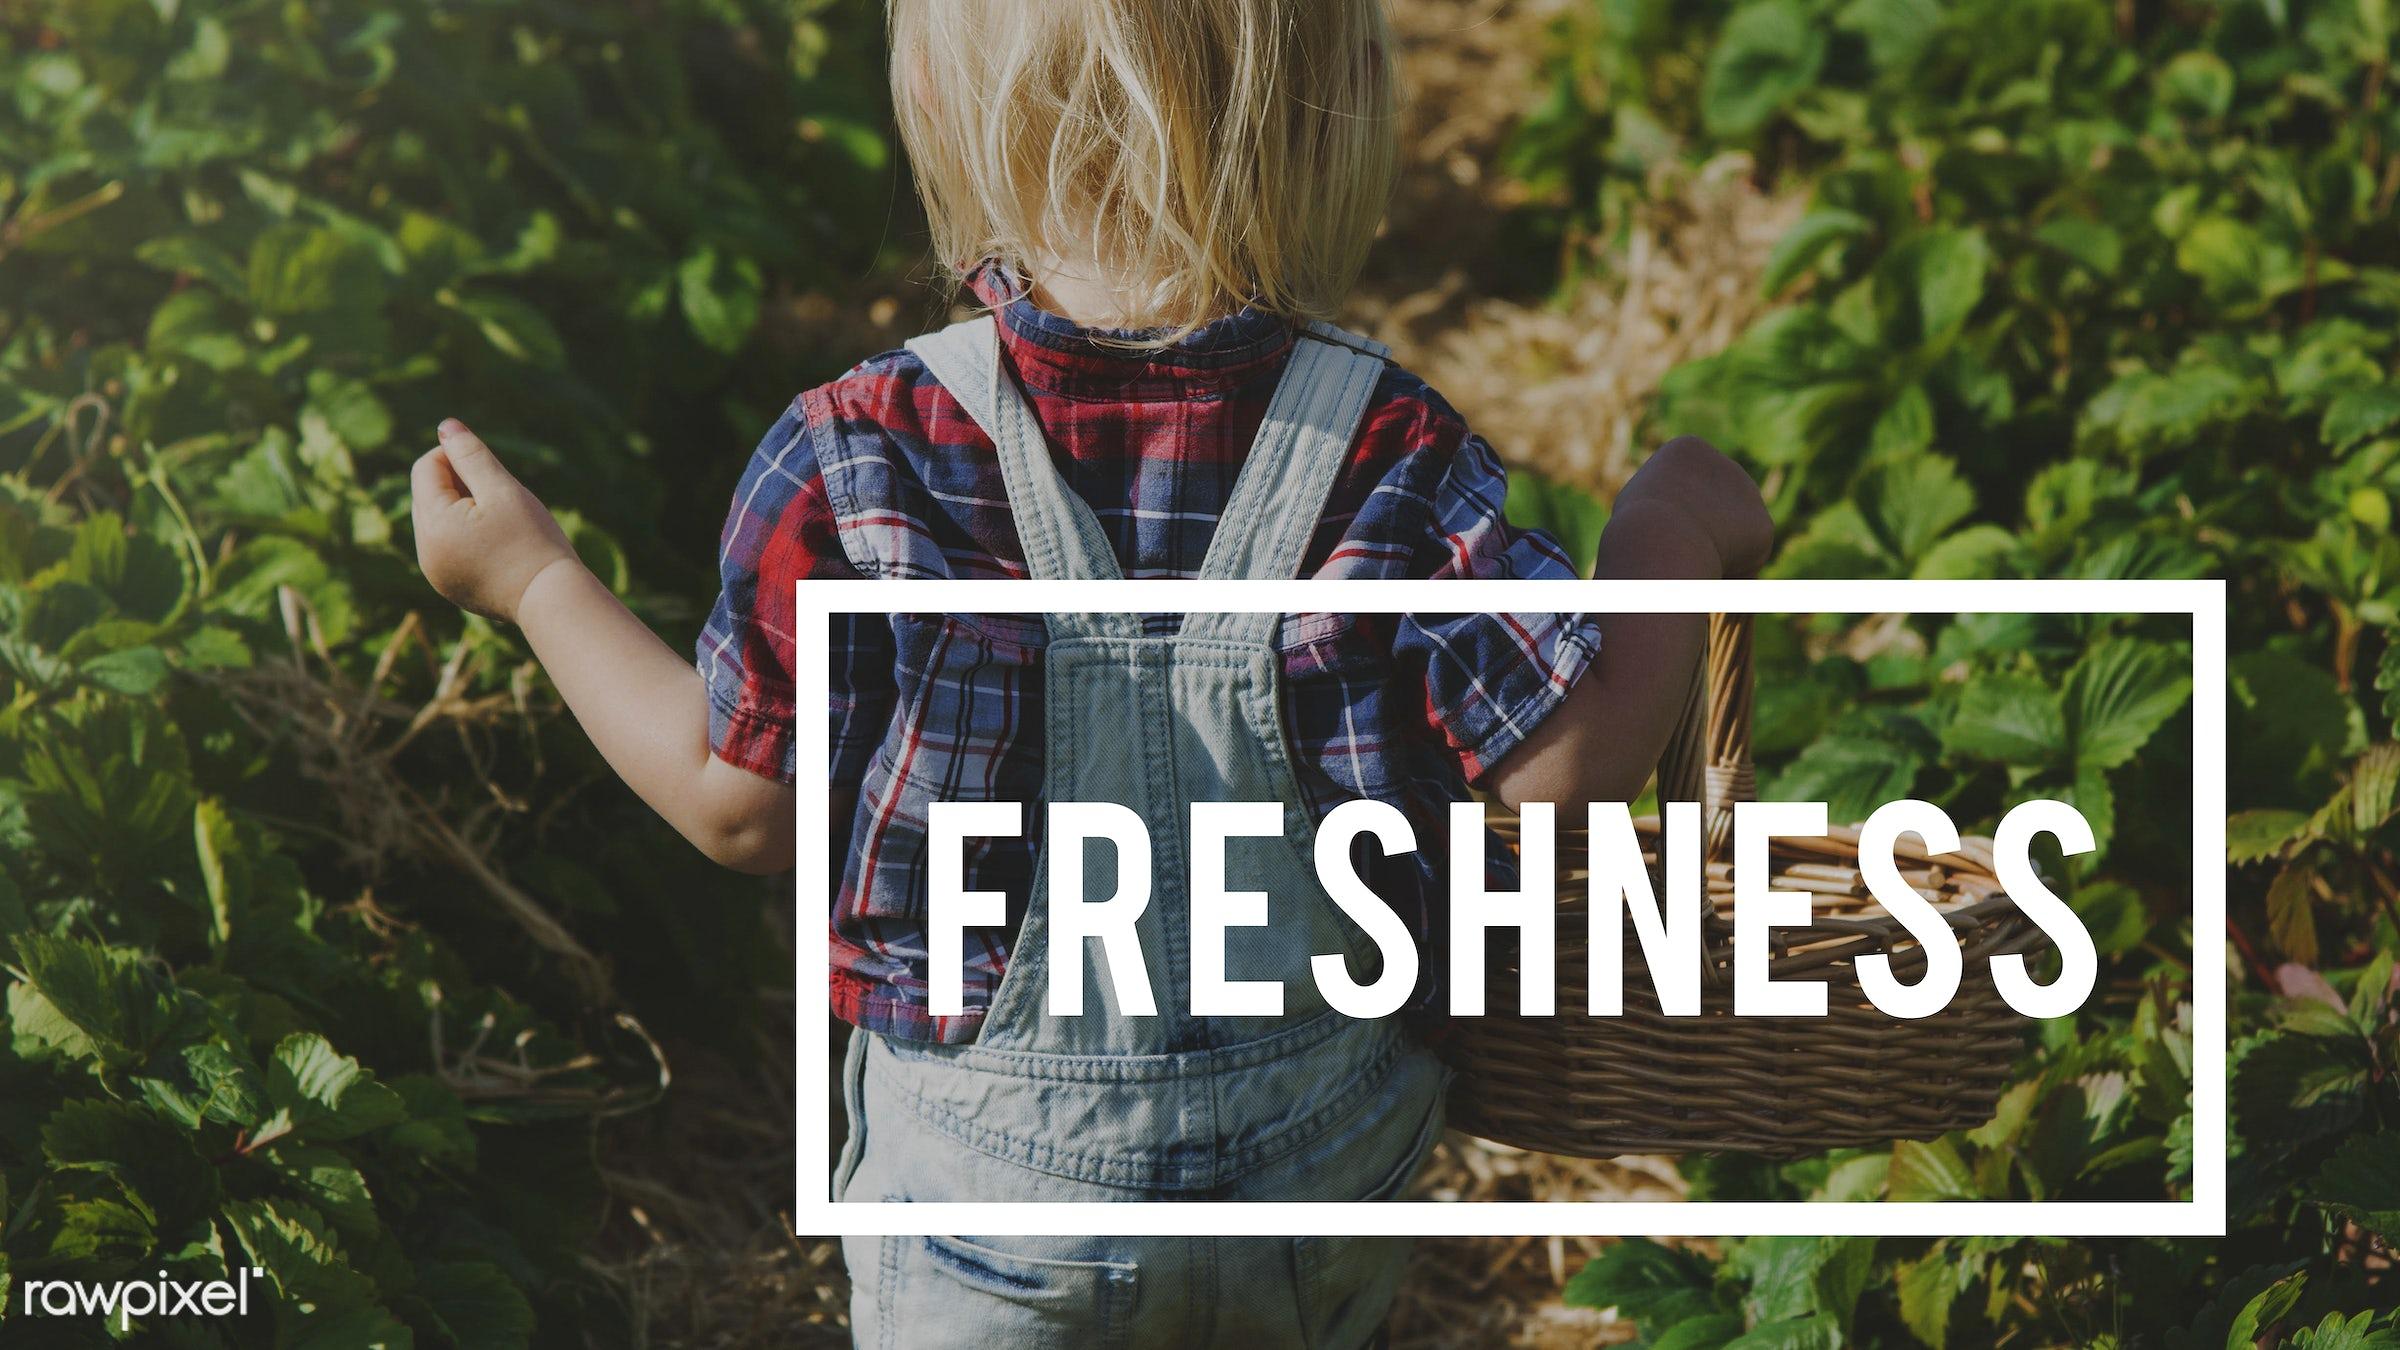 basket, blonde, boy, caucasian, dungarees, eco, ecology, environment, environmental, farm, fresh, freshness, fruit, fun,...